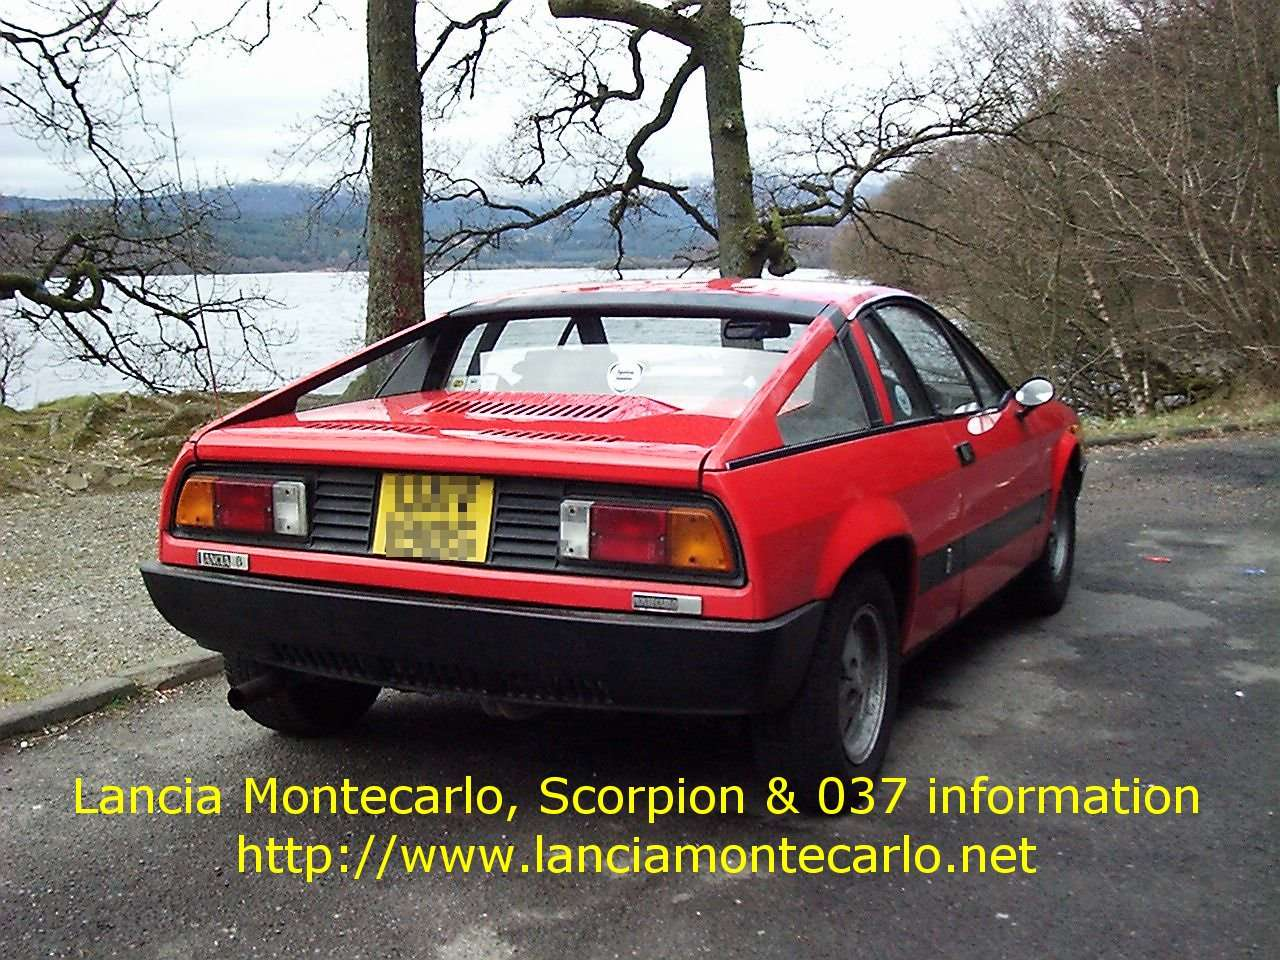 lancia montecarlo photo gallery